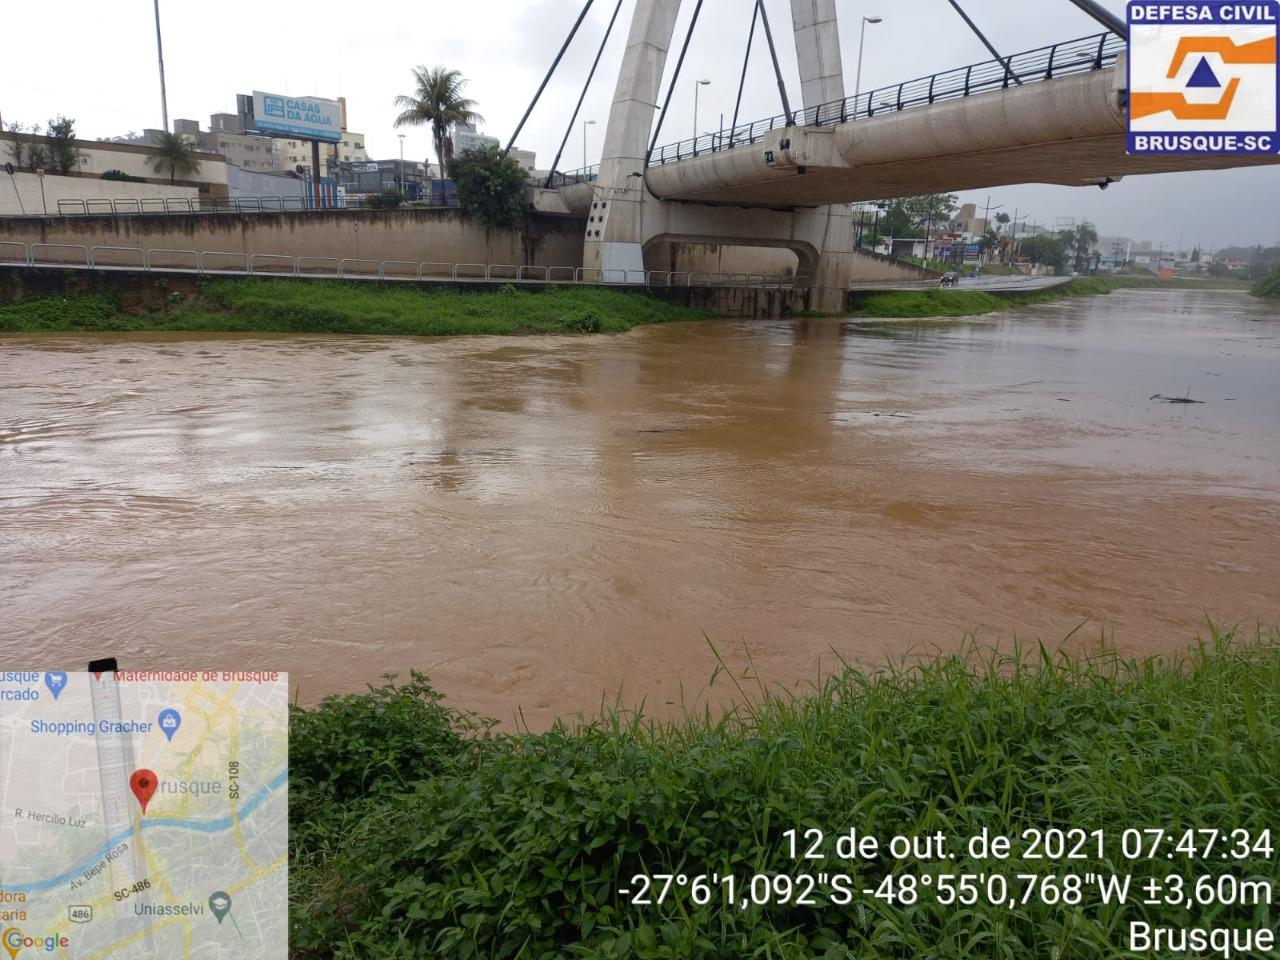 Rio Itajaí-Mirim deve sair da calha na tarde desta terça-feira (12)